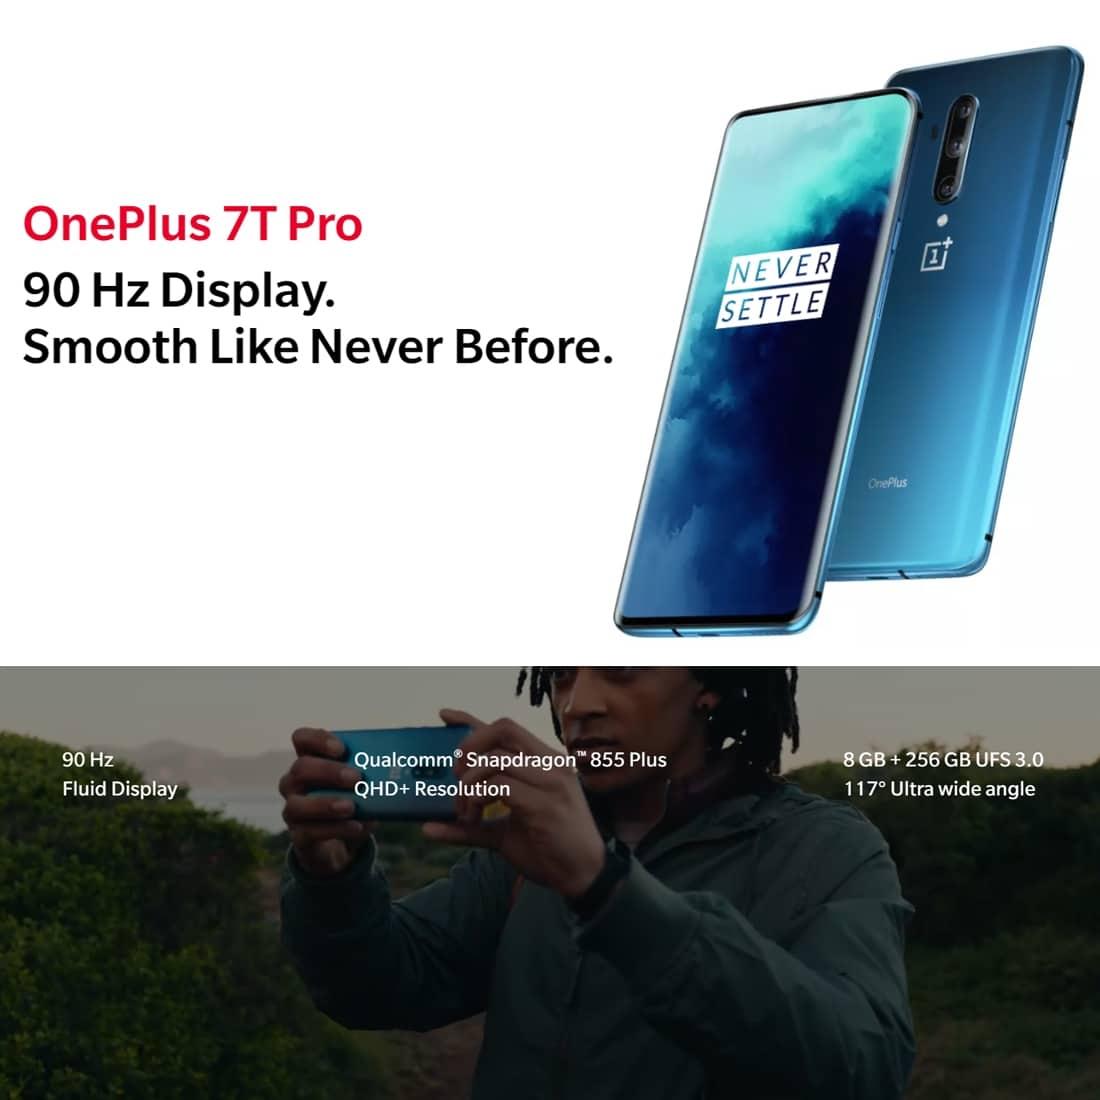 OnePlus 7T Pro Smartphone